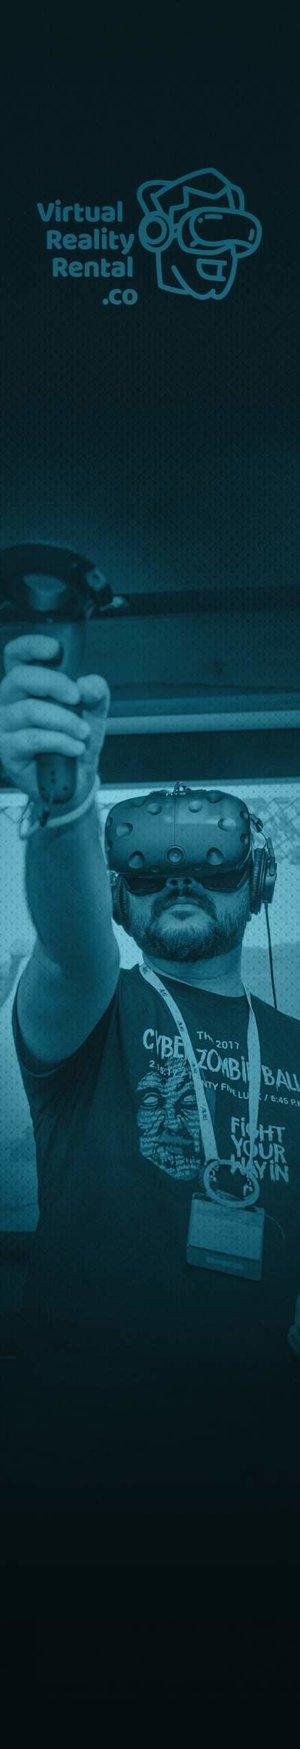 Virtual+Reality+Rental__1564218831_203.76.248.53.jpg